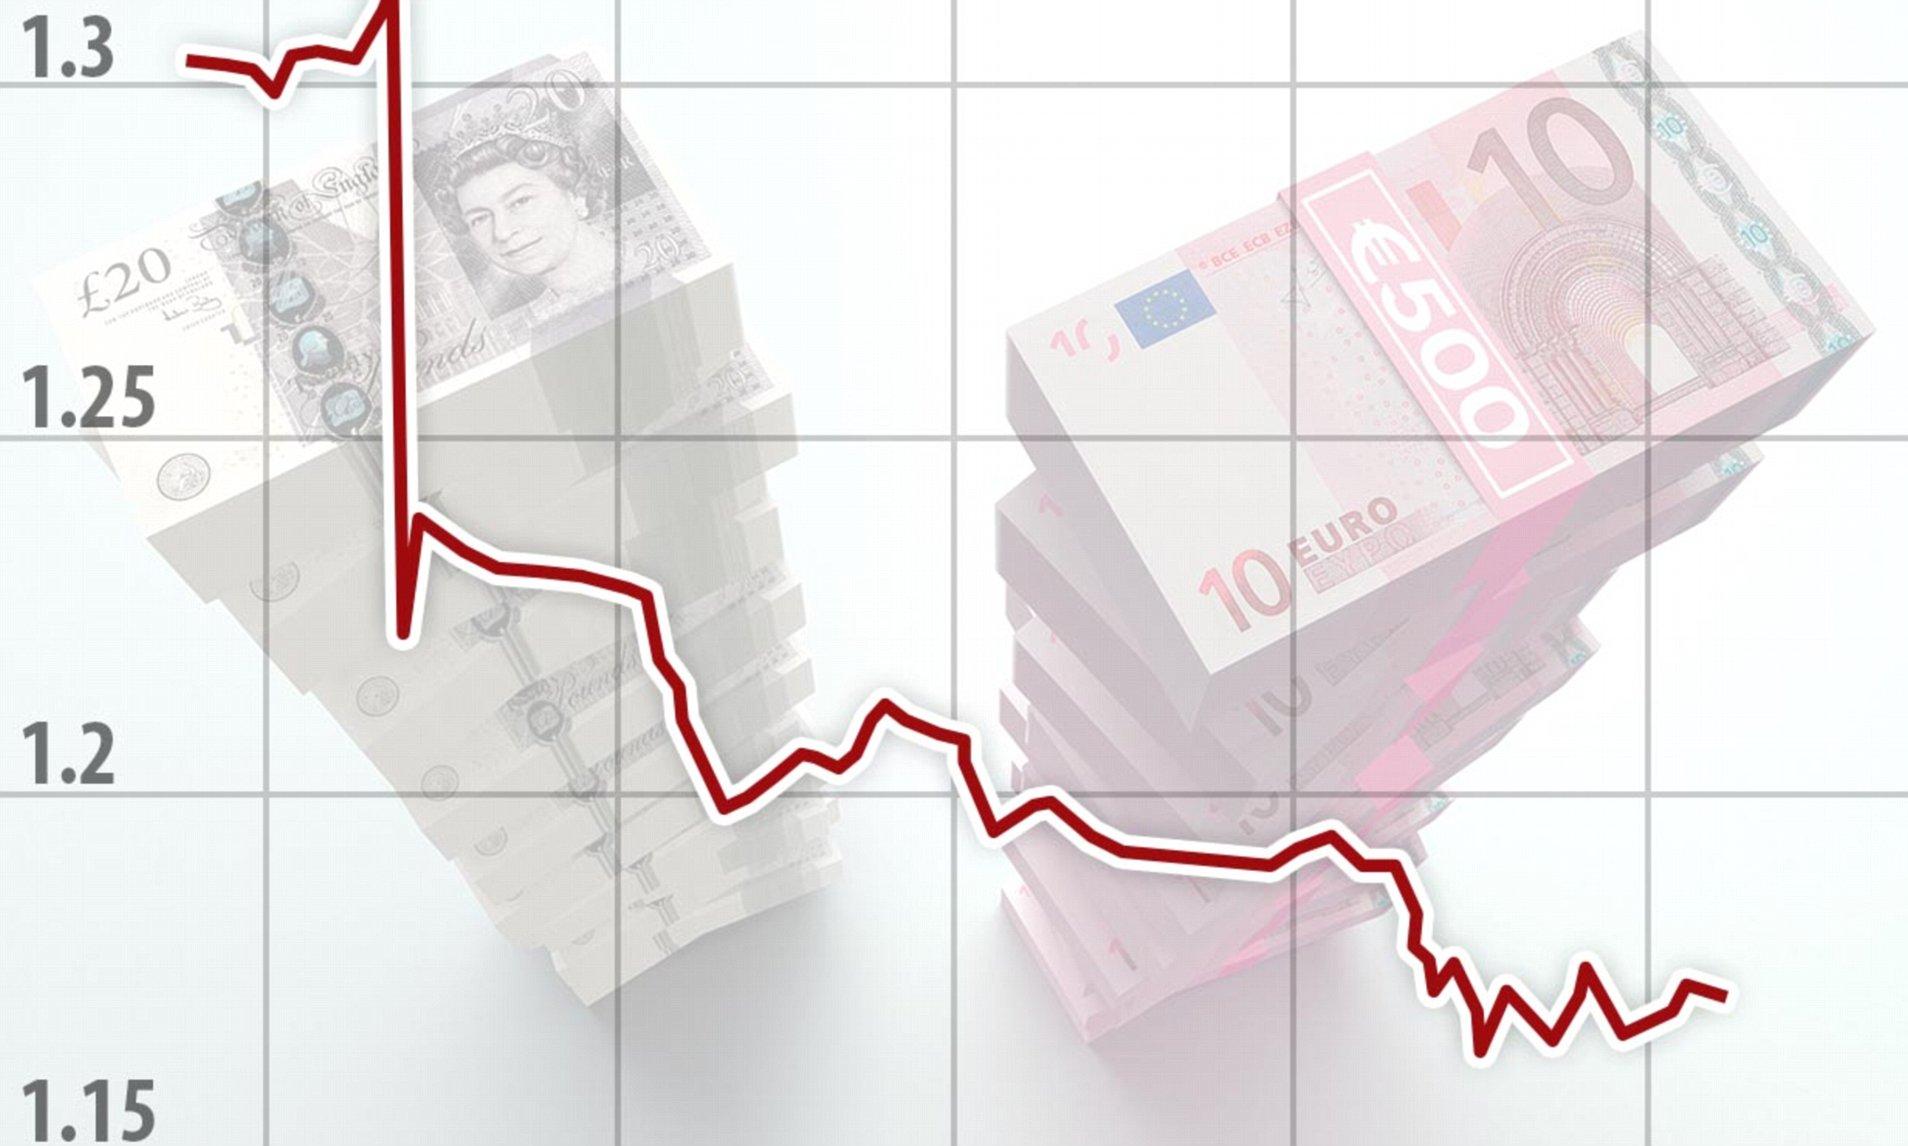 Travel Money Currency Tourist Exchange Rates Moneycorp